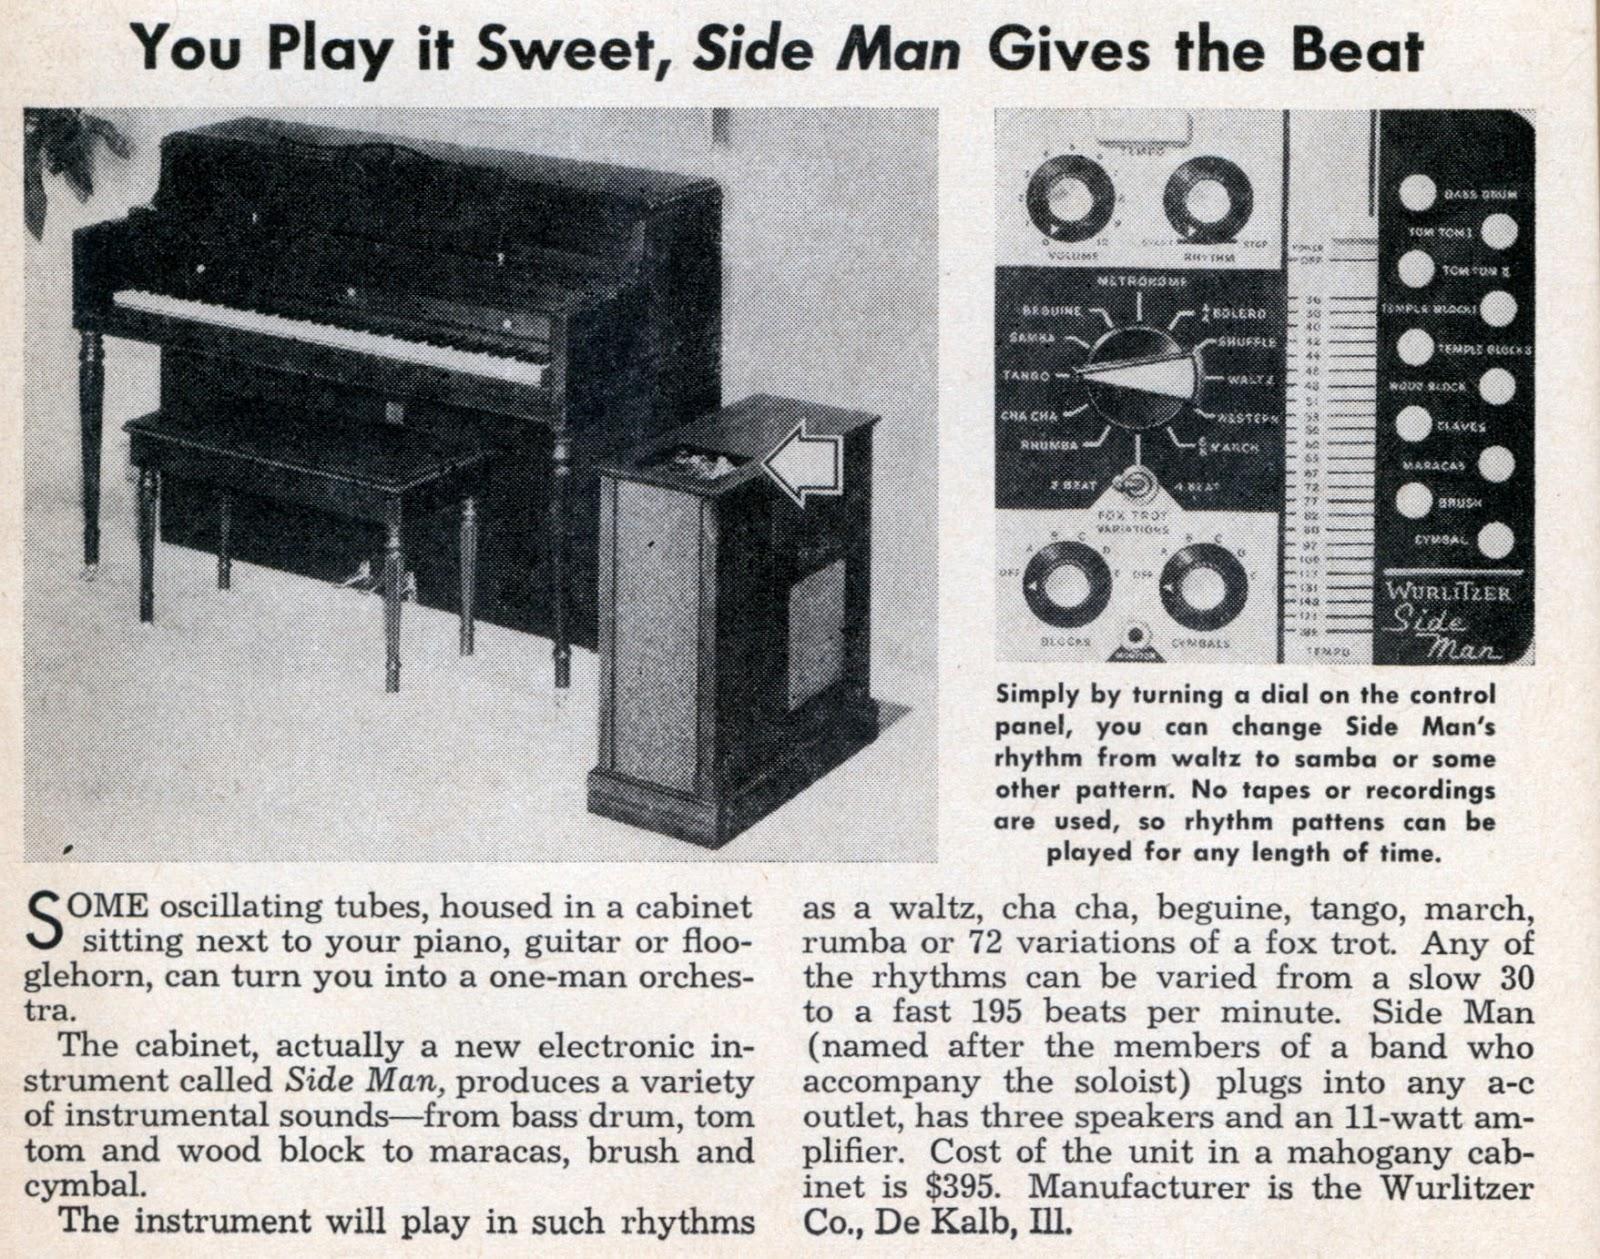 Teclado electrico con caja de ritmos de 1970.